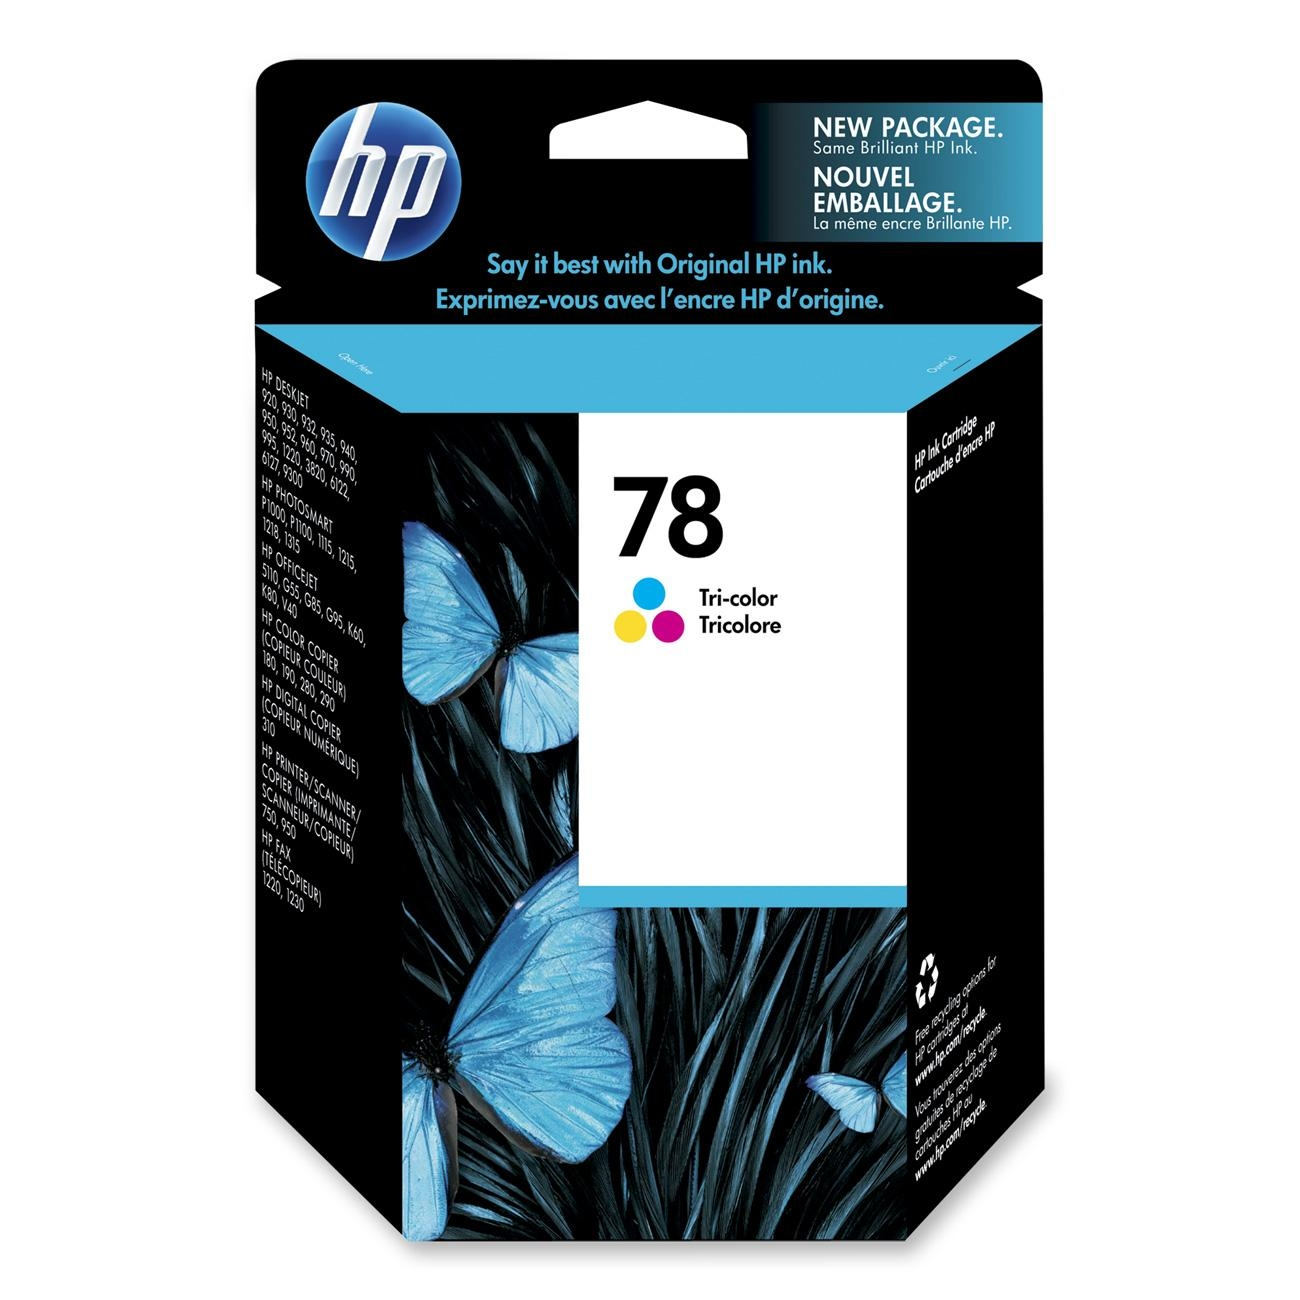 Printer not printing color hp - Printer Not Printing Color Hp 43